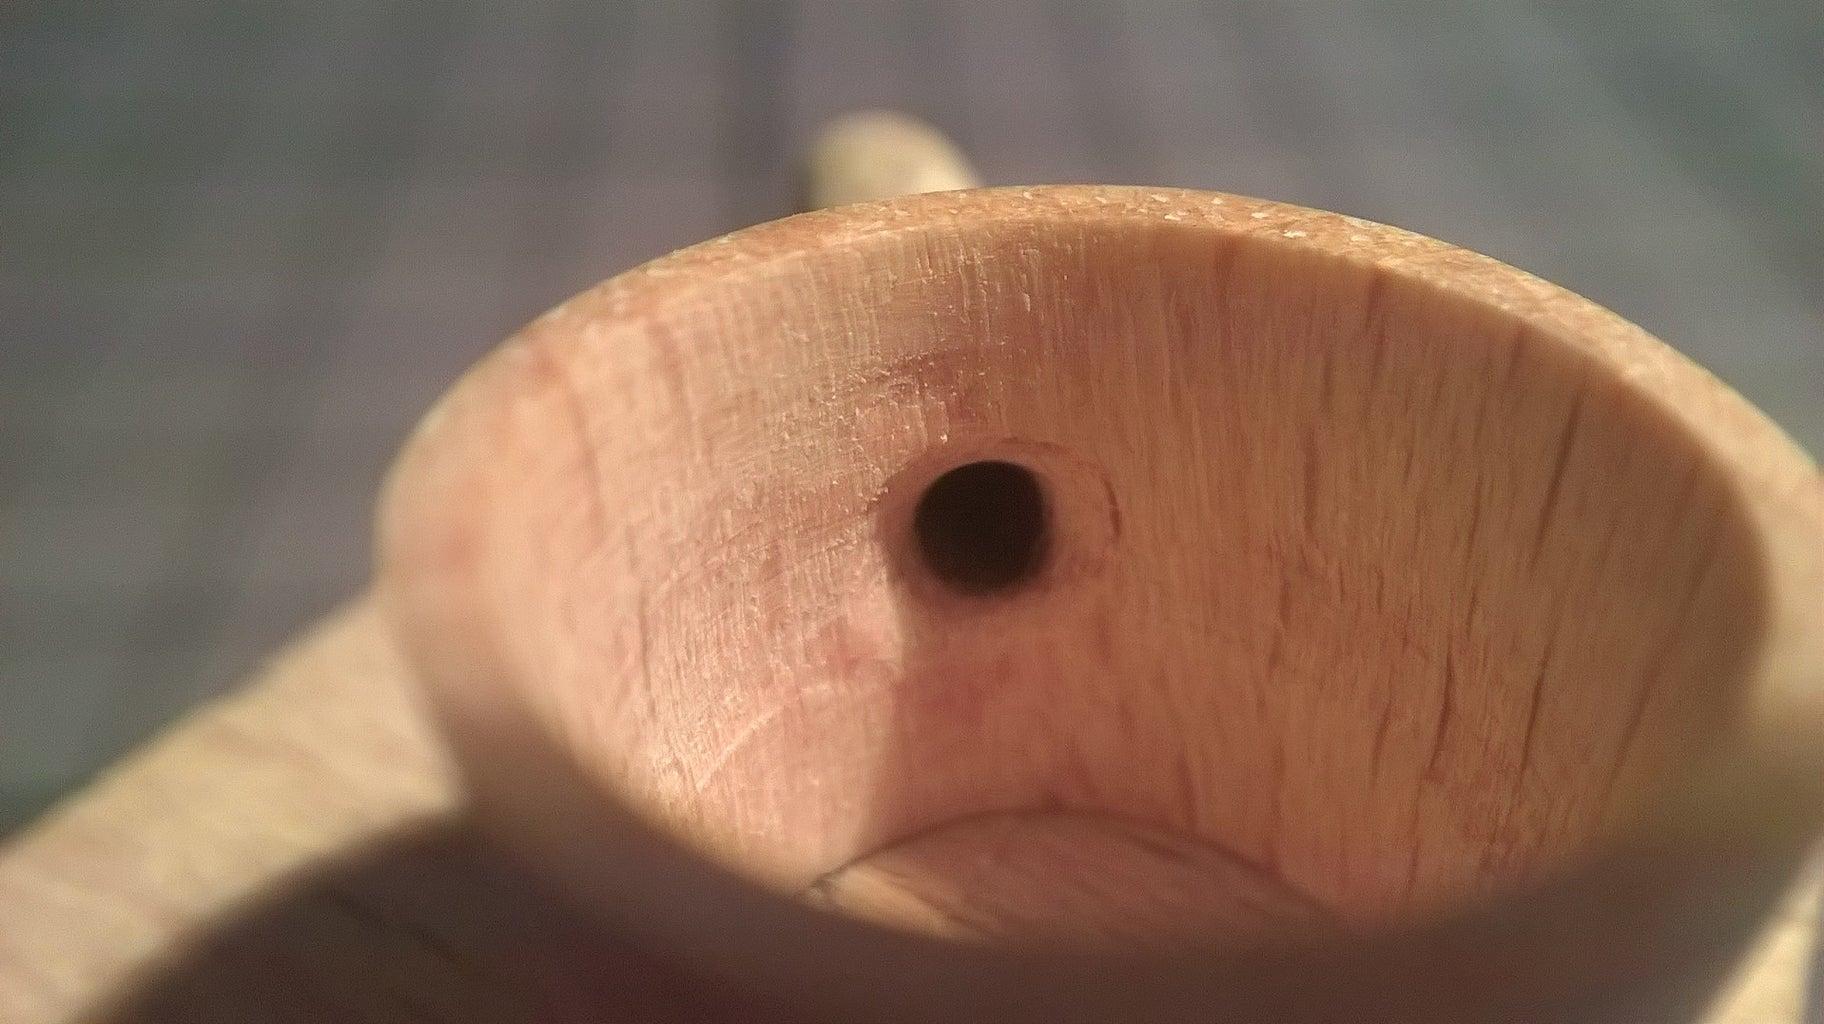 Fine Work, Needle Filing